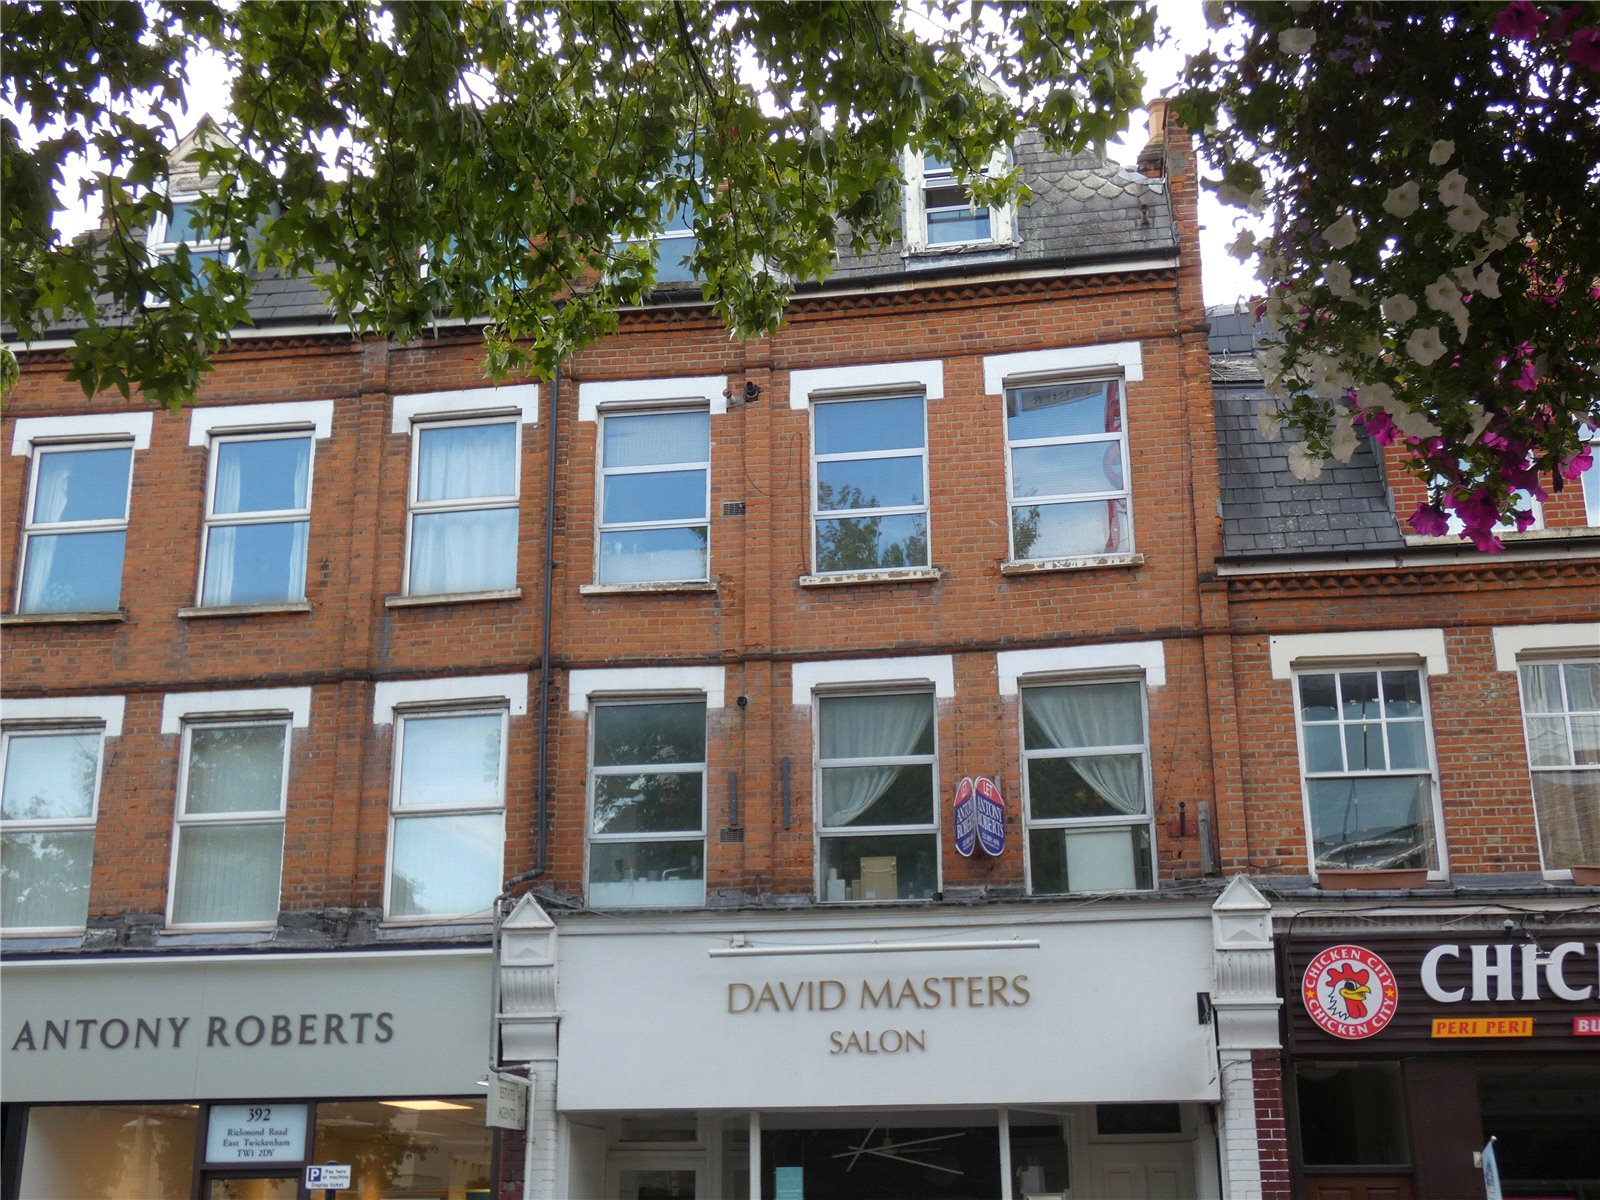 390a Richmond Road, East Twickenham, TW1 2DY - Antony Roberts